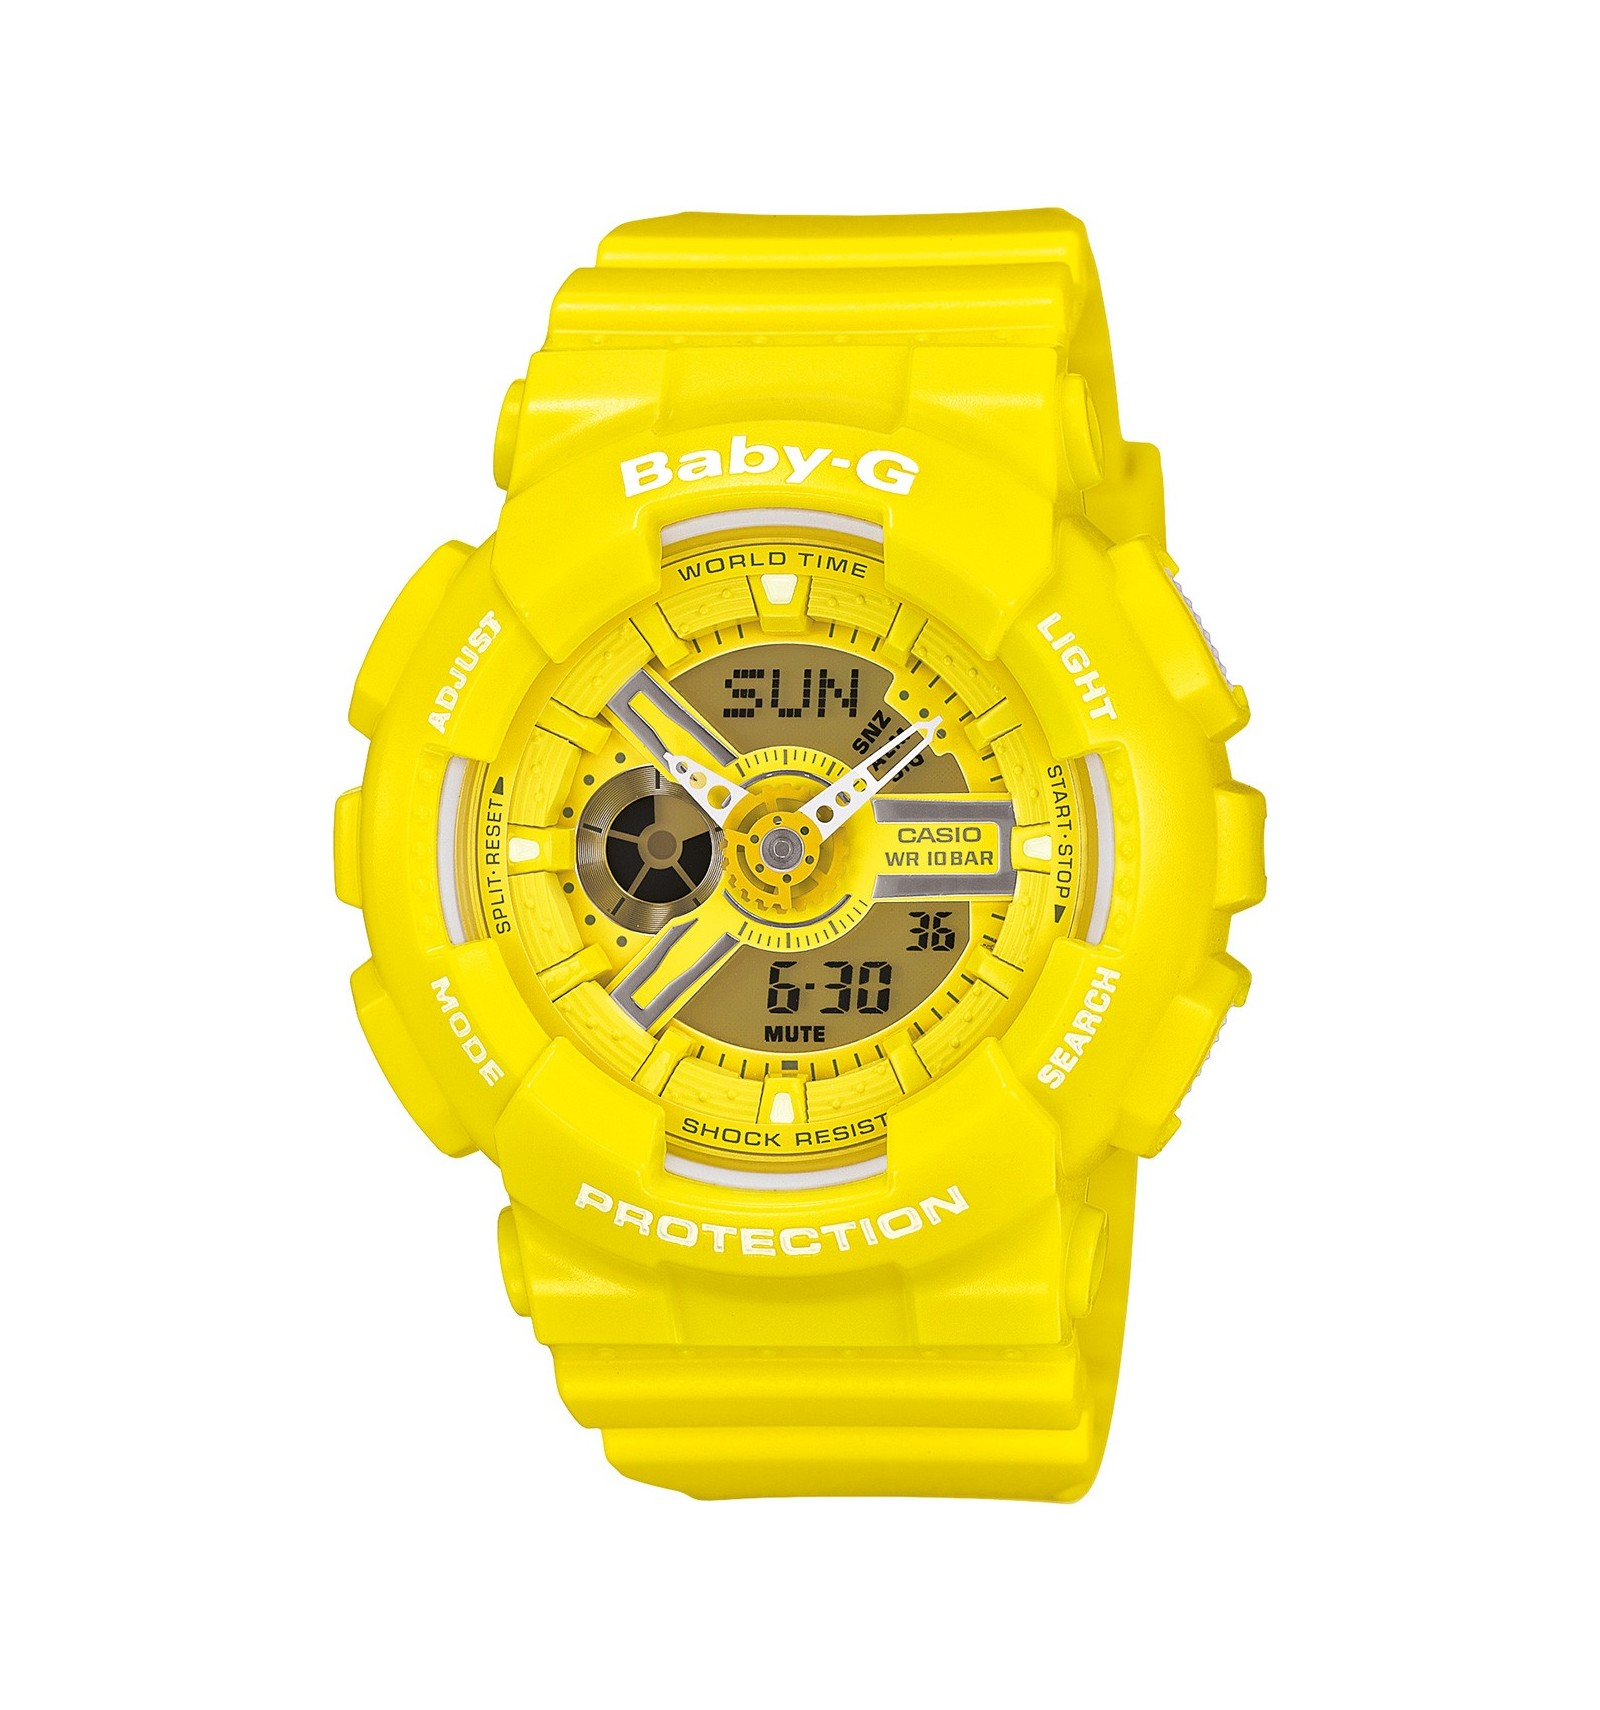 Baby-G Casio Все часы коллекции Baby-G Casio на